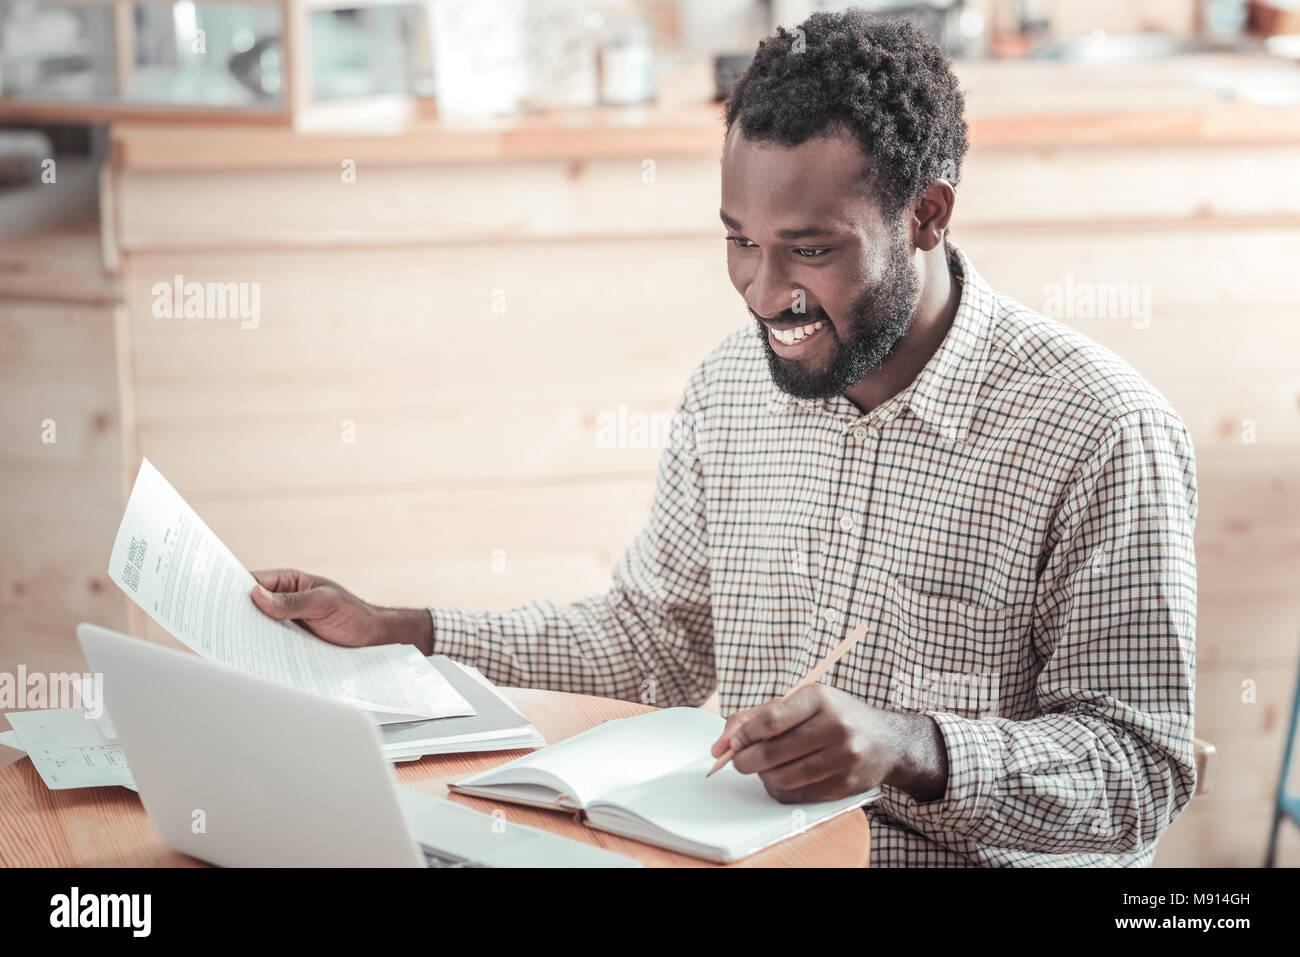 Joyful positive man preparing his home task - Stock Image